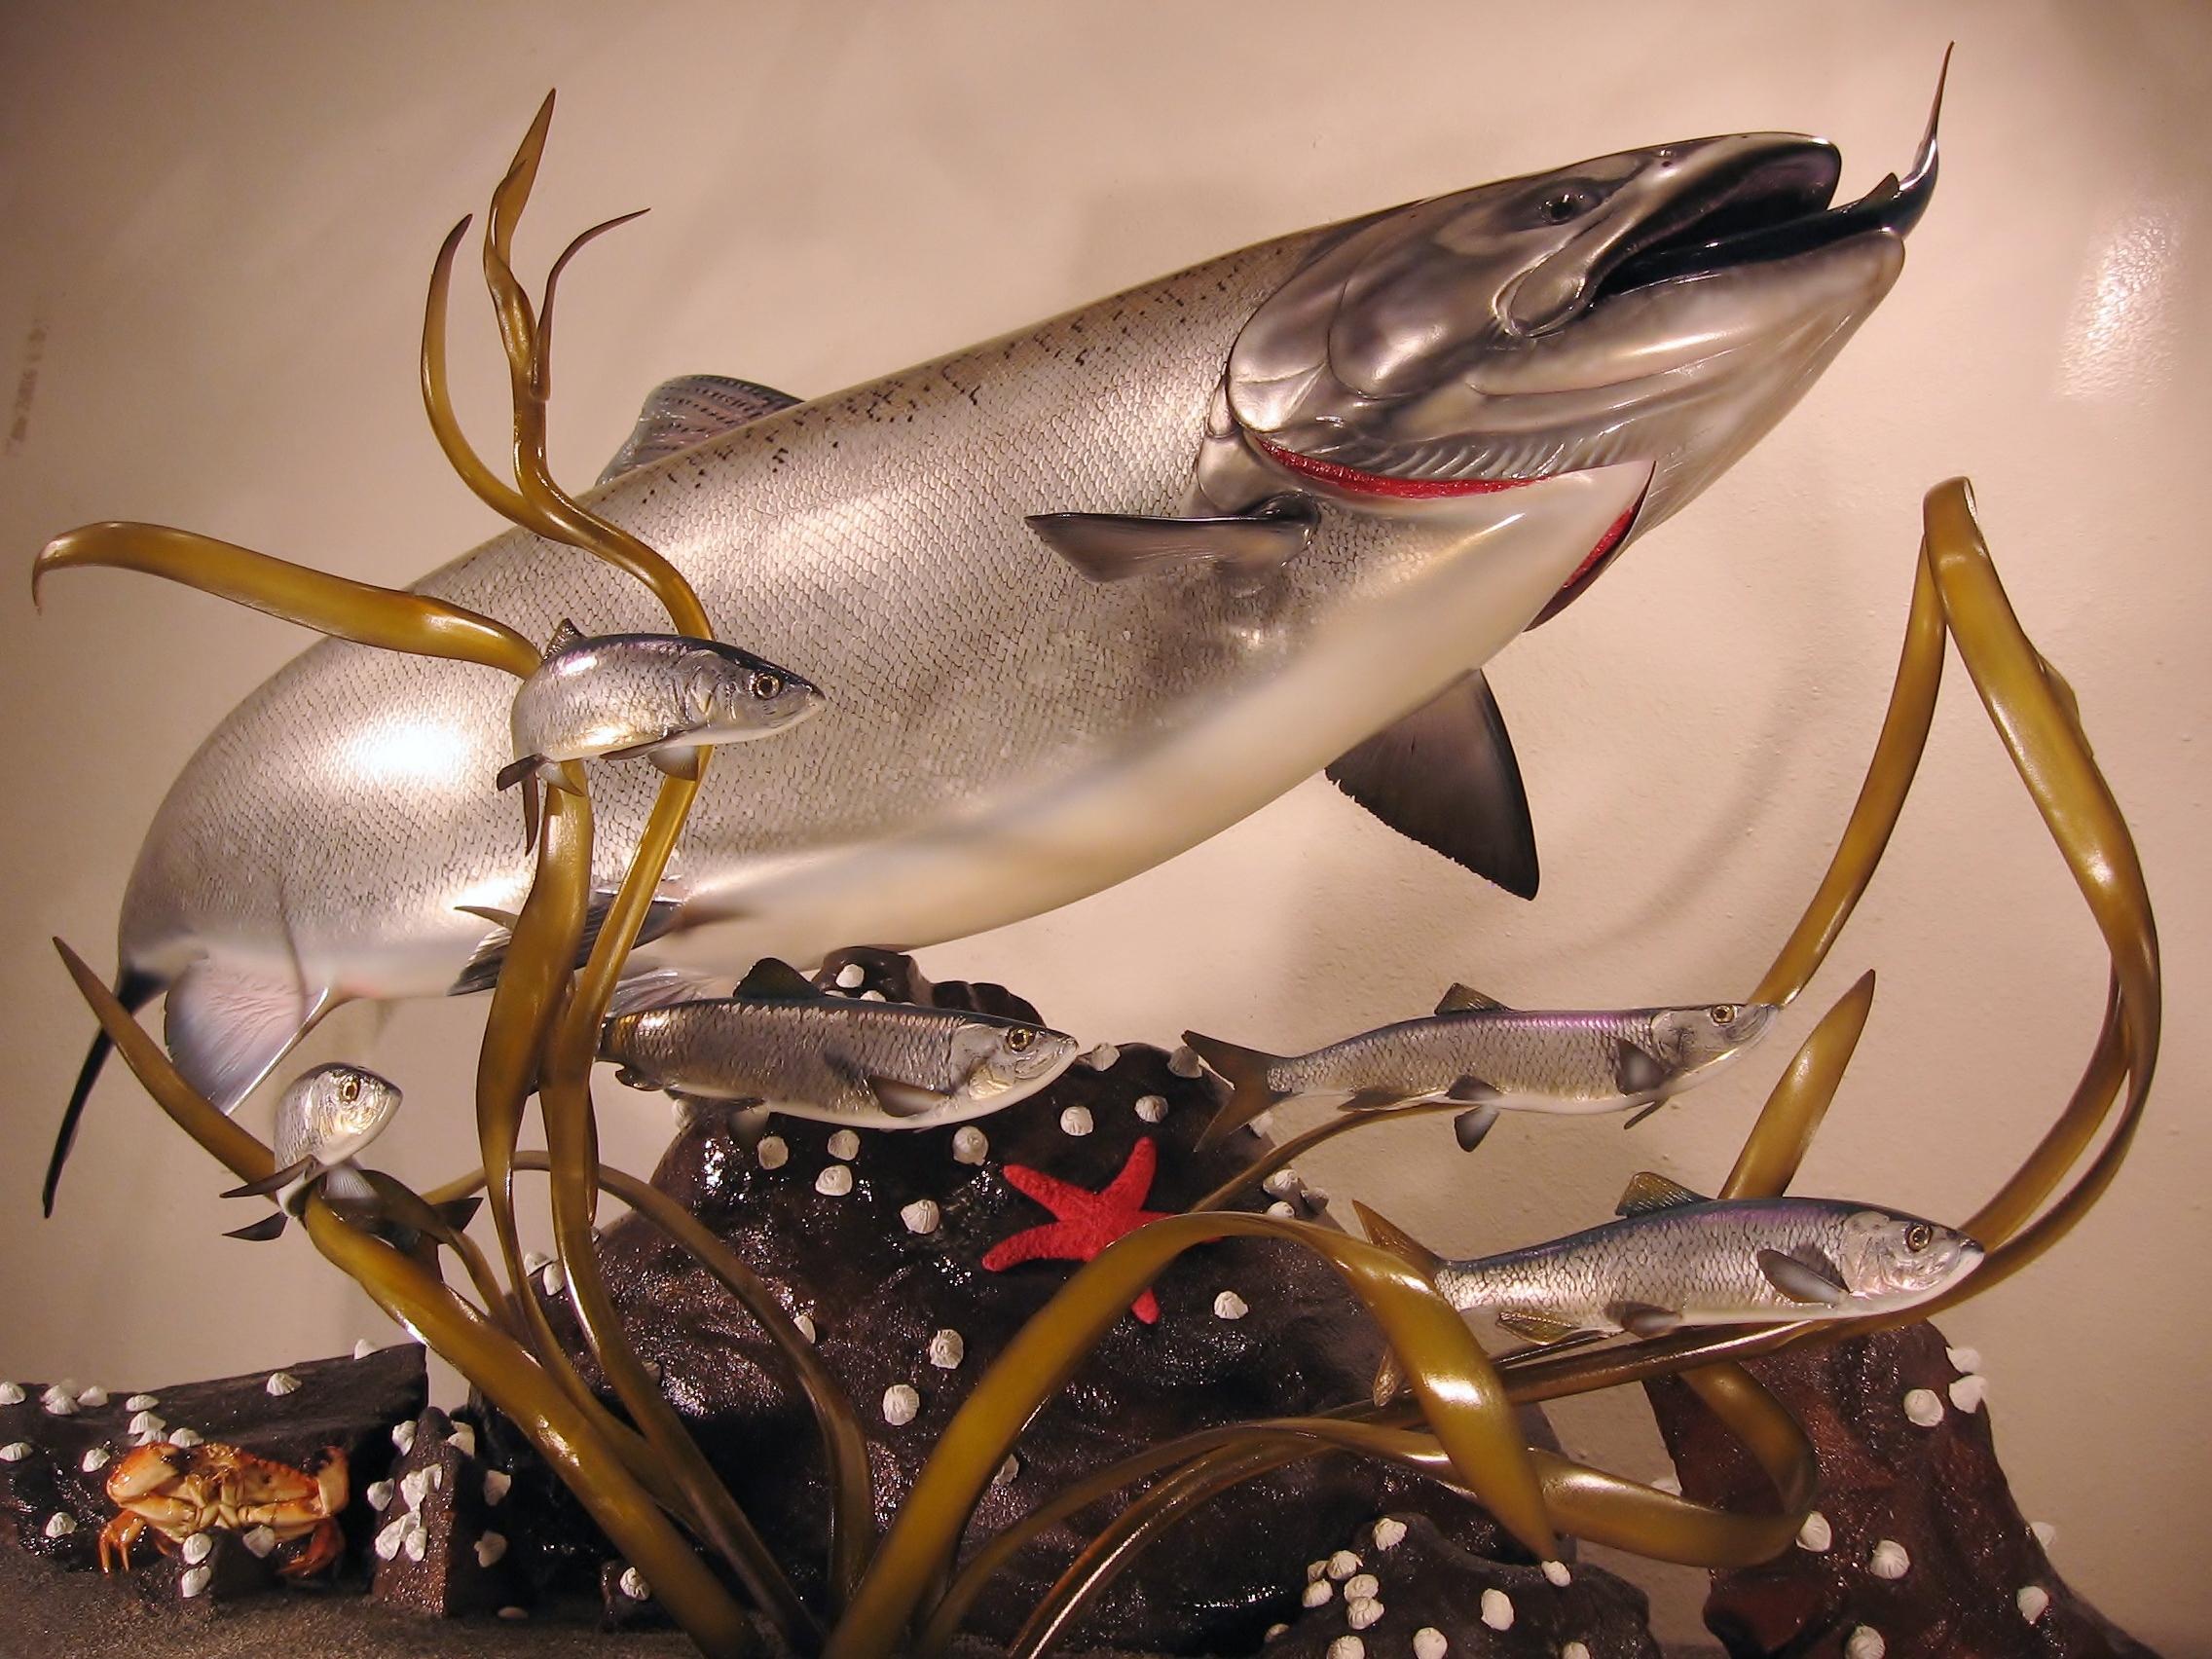 King Salmon fish replica mount created by fish artist Luke Filmer